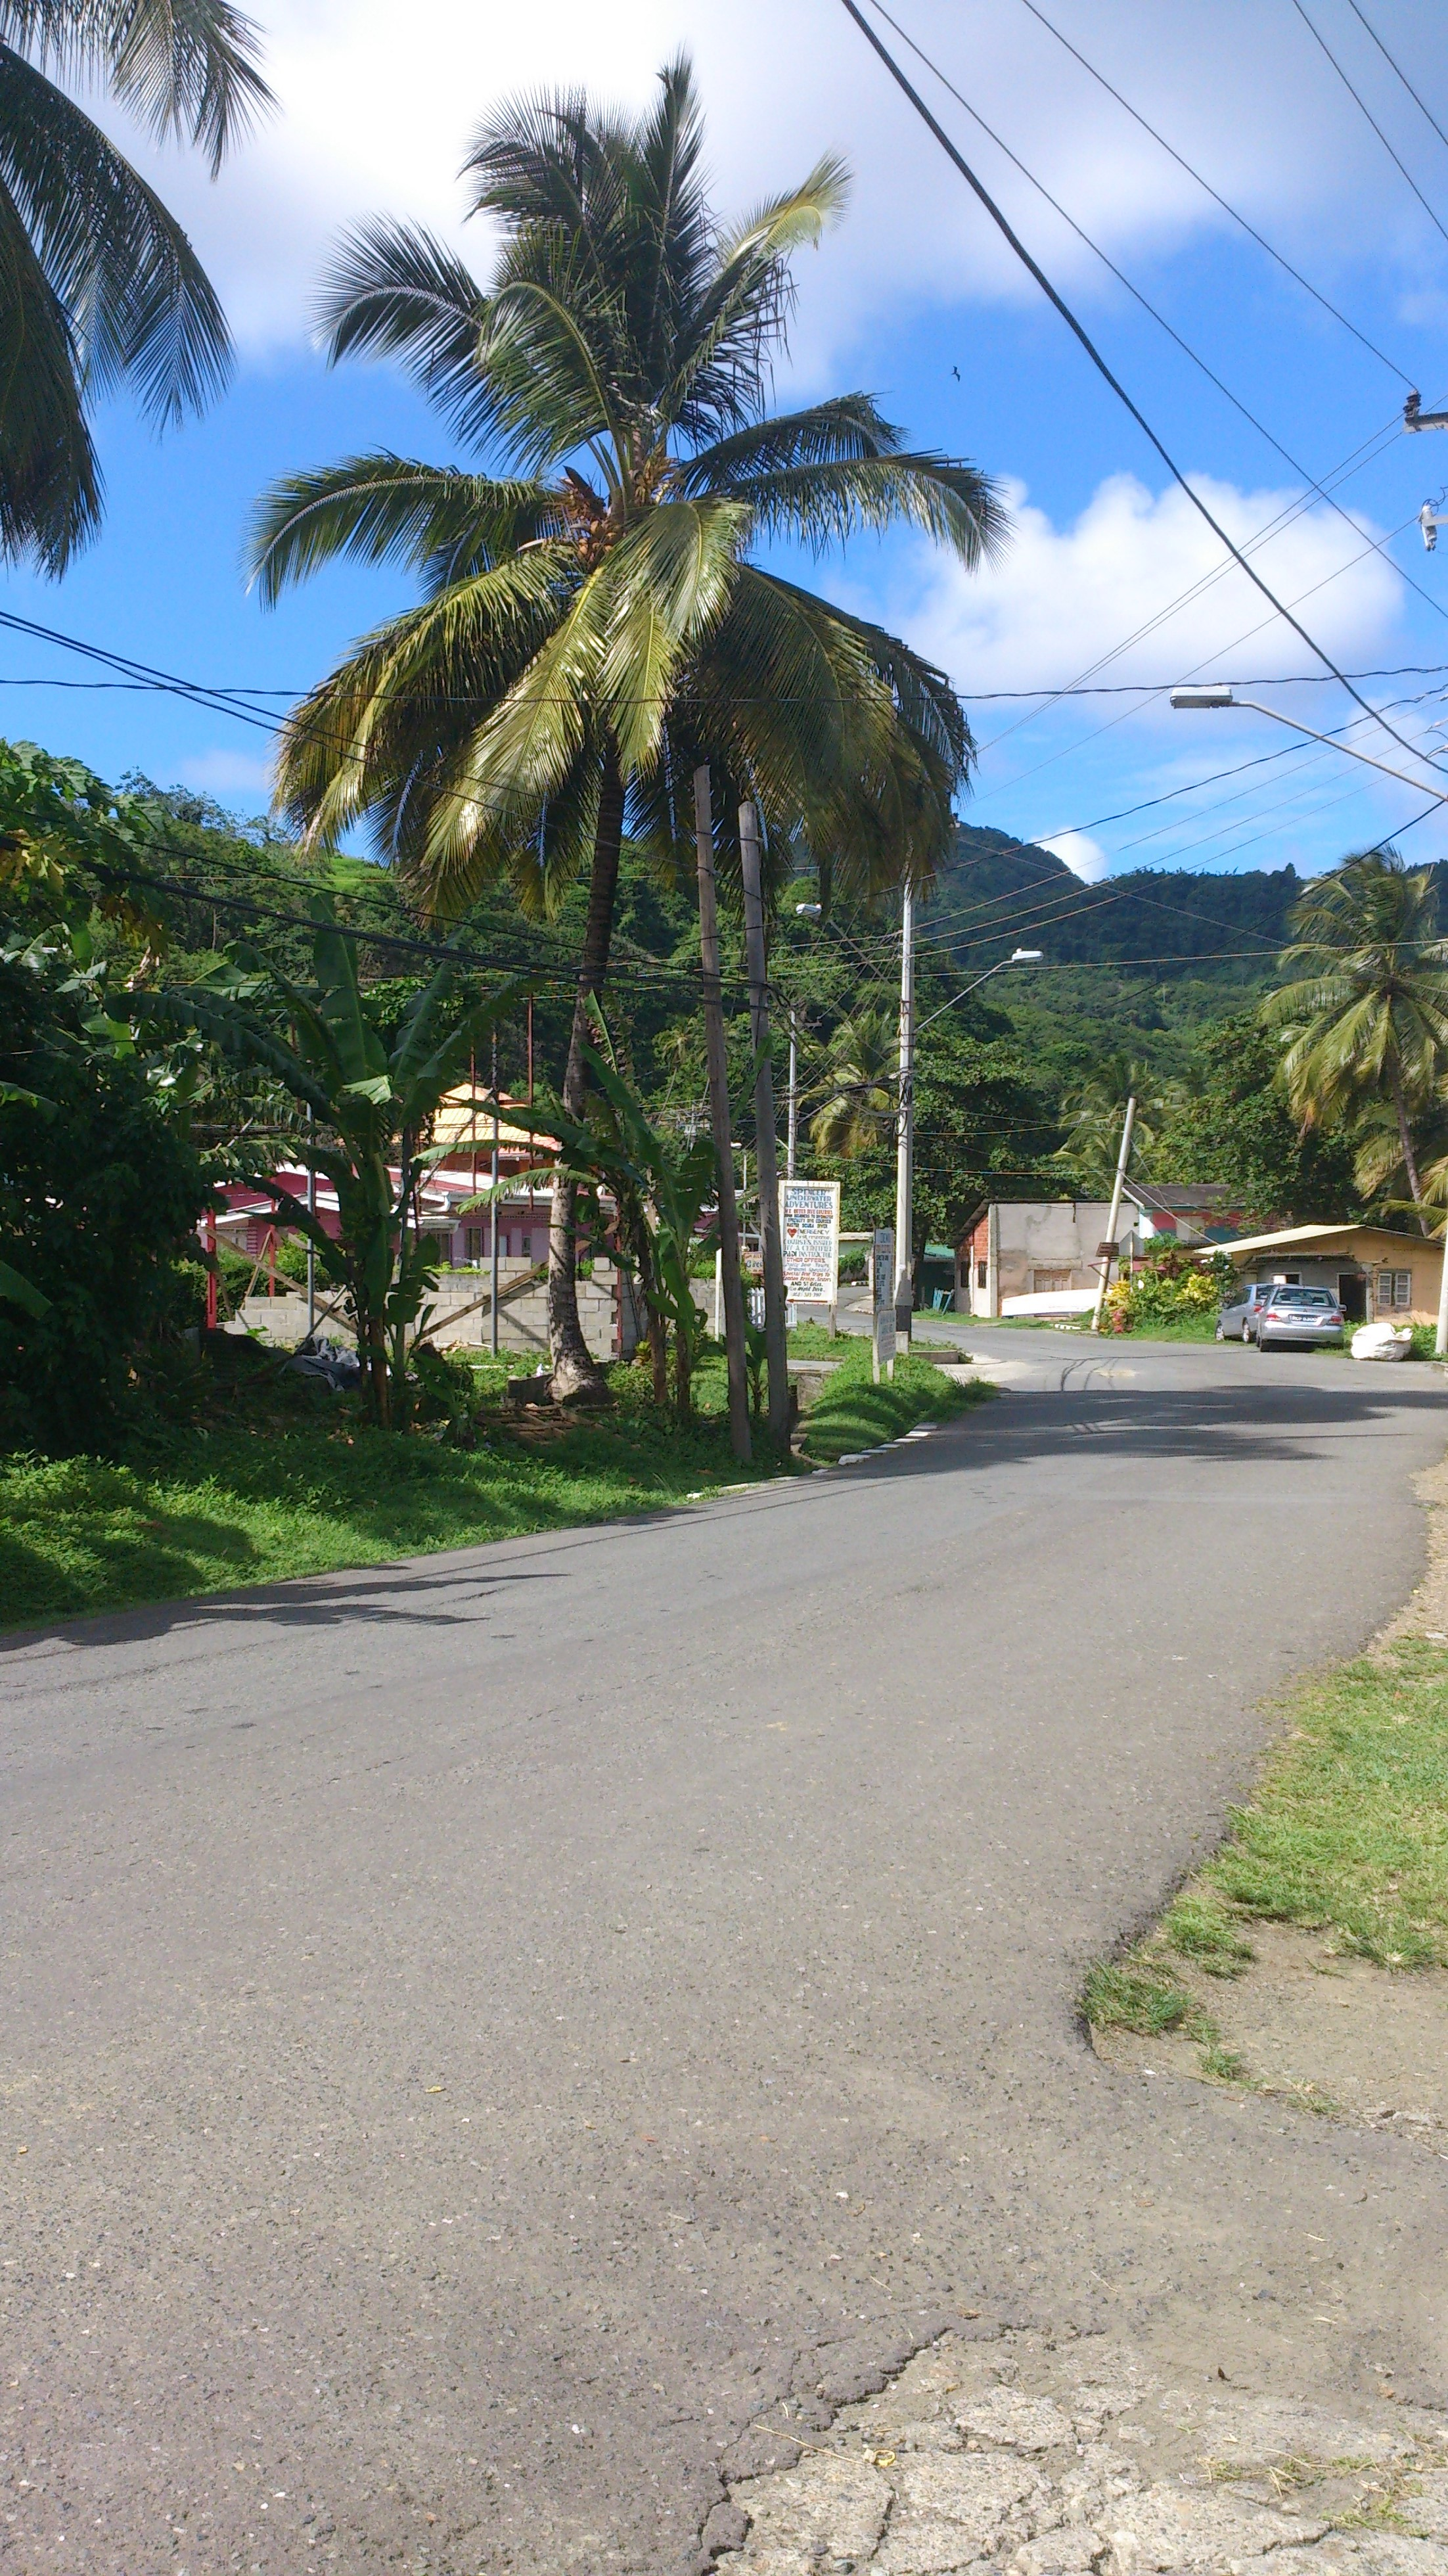 Streetview in Speyside